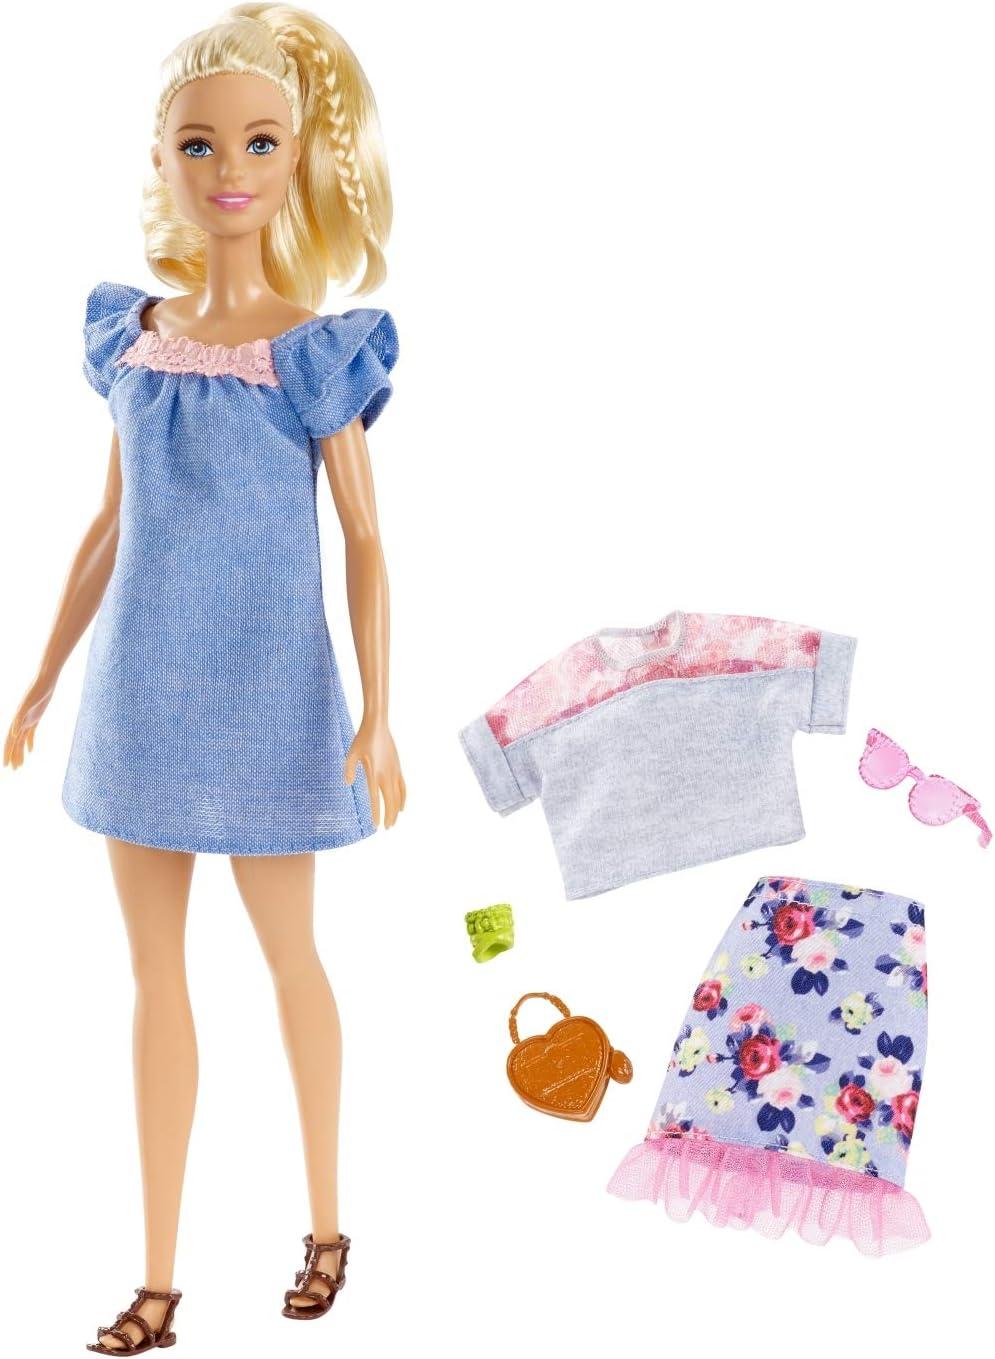 Amazon.es: Barbie-FRY79 Muñeca Fashionista Rubia con Modas ...